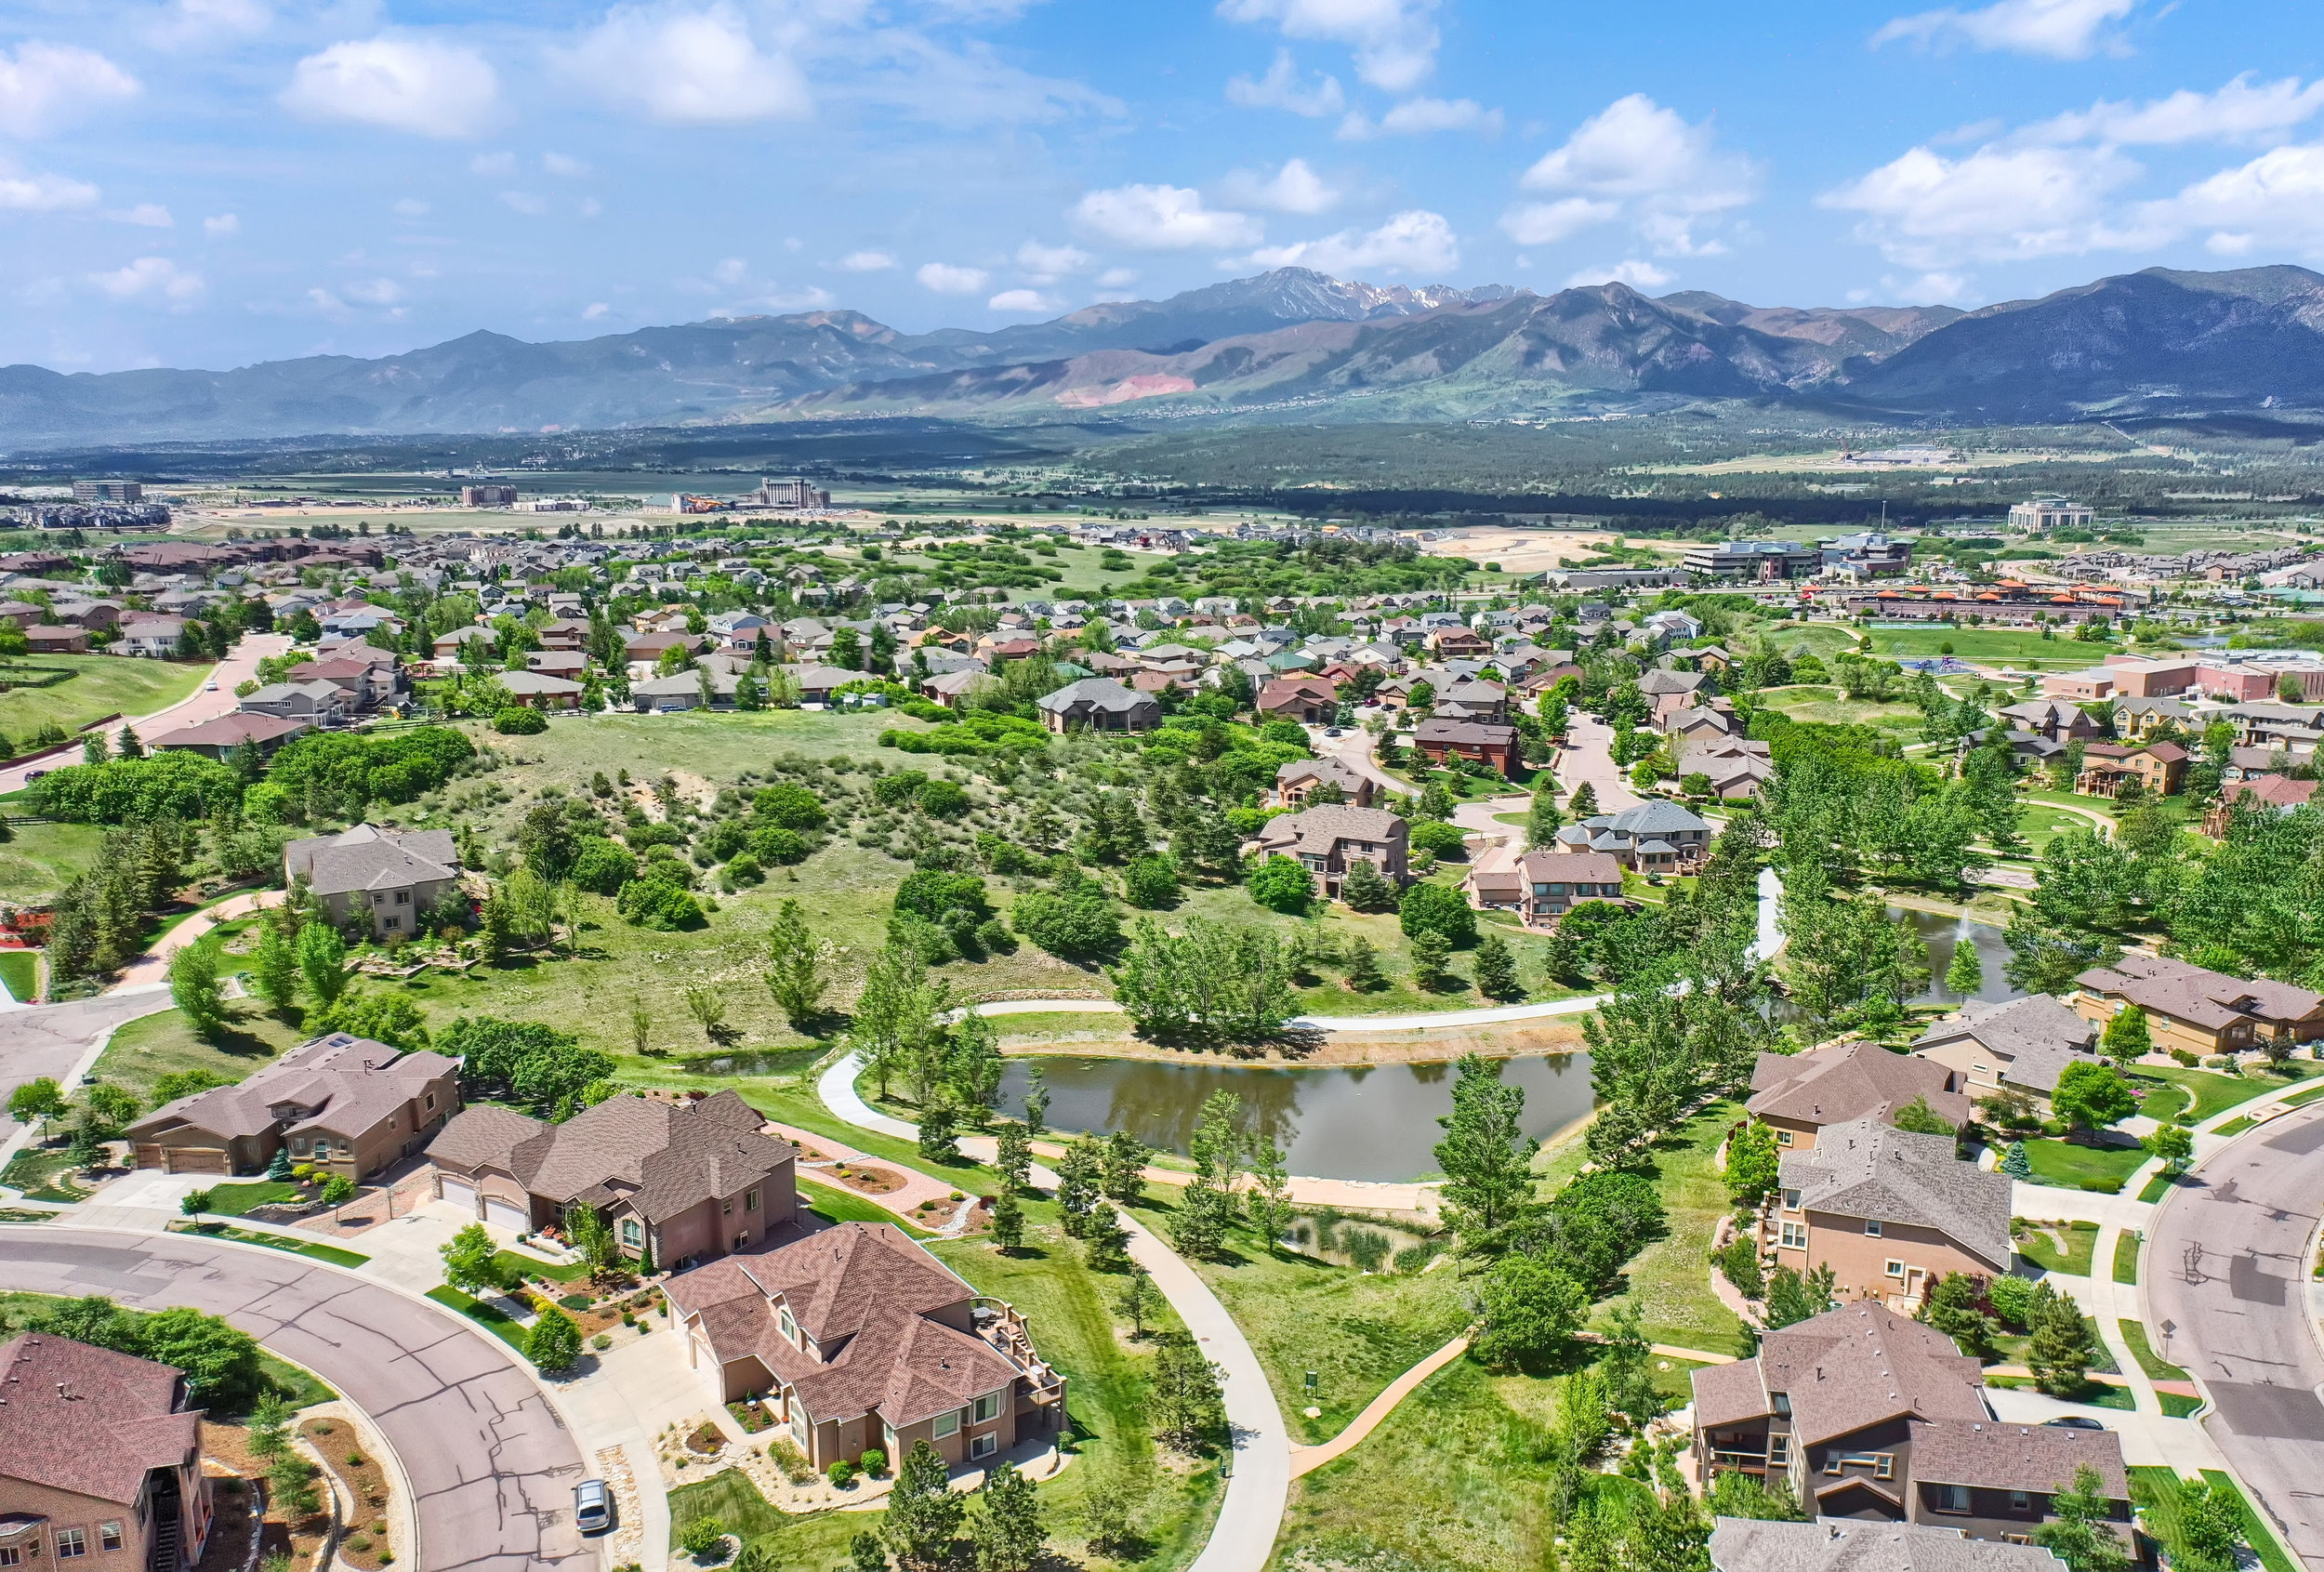 12496 Creekhurst Dr Colorado-print-001-021-Aerial-4200x2841-300dpi.jpg